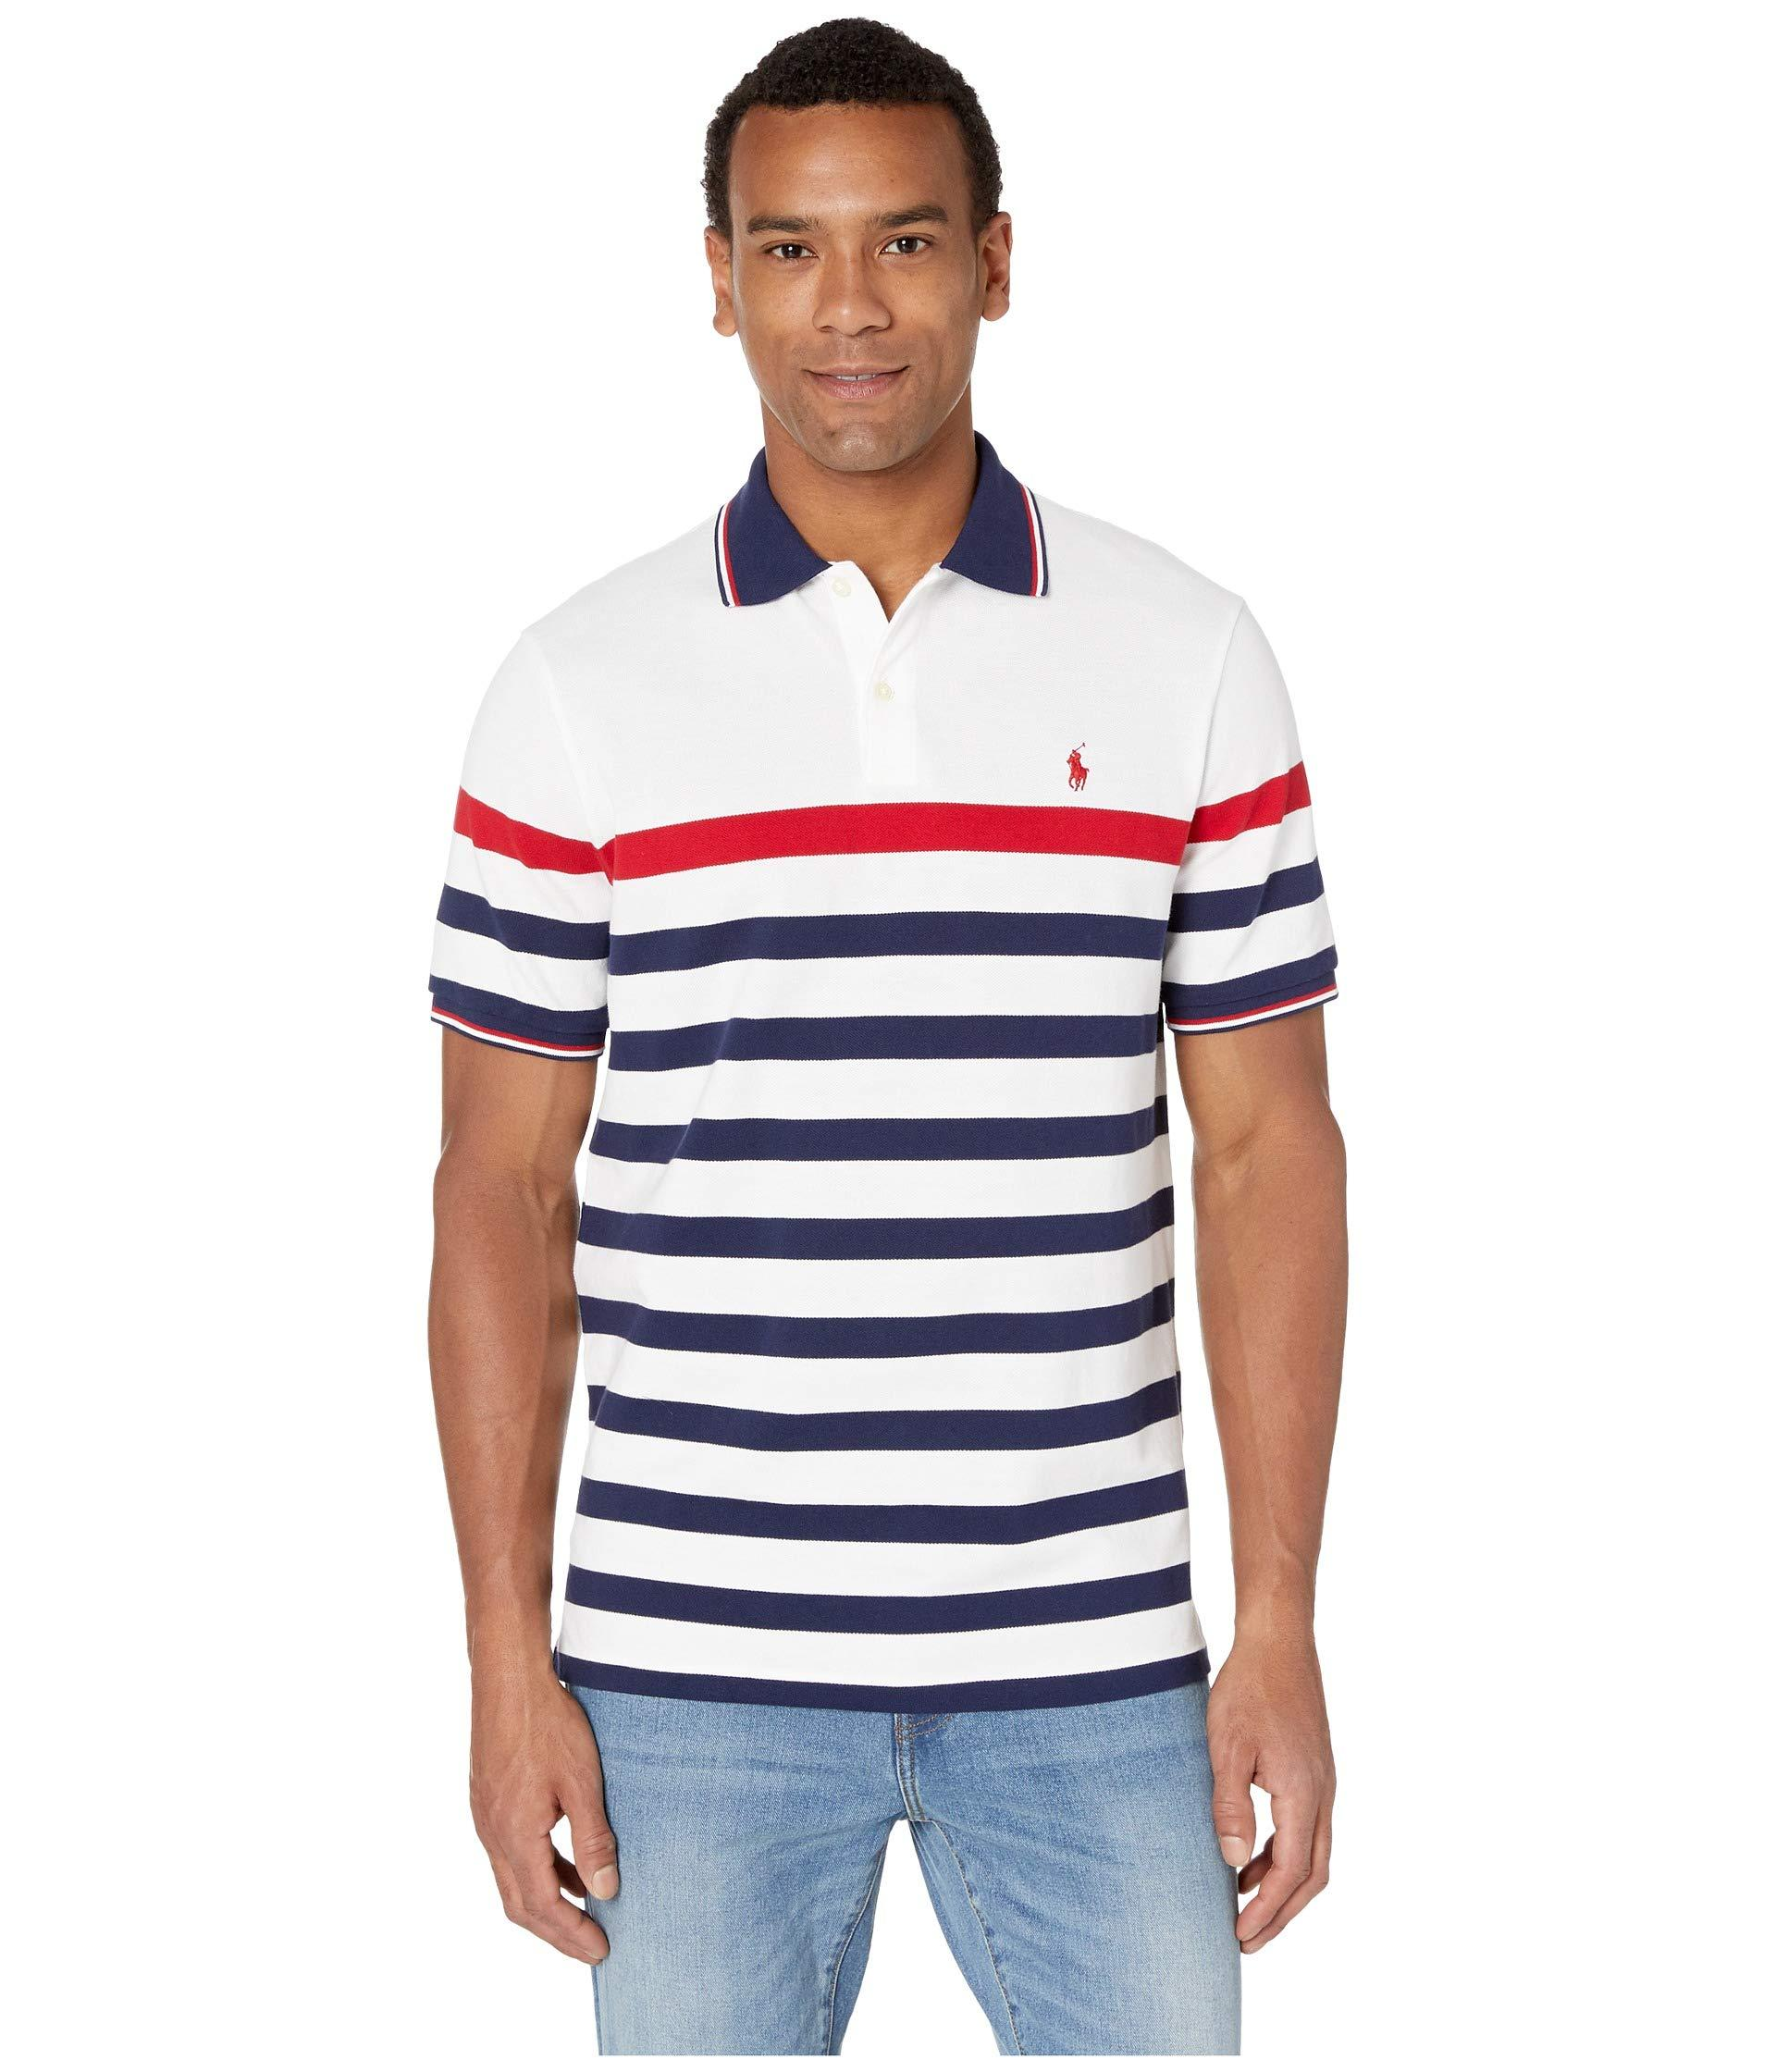 3eaa2e47 Lyst - Polo Ralph Lauren Short Sleeve Classic Fit Mesh Polo (white ...